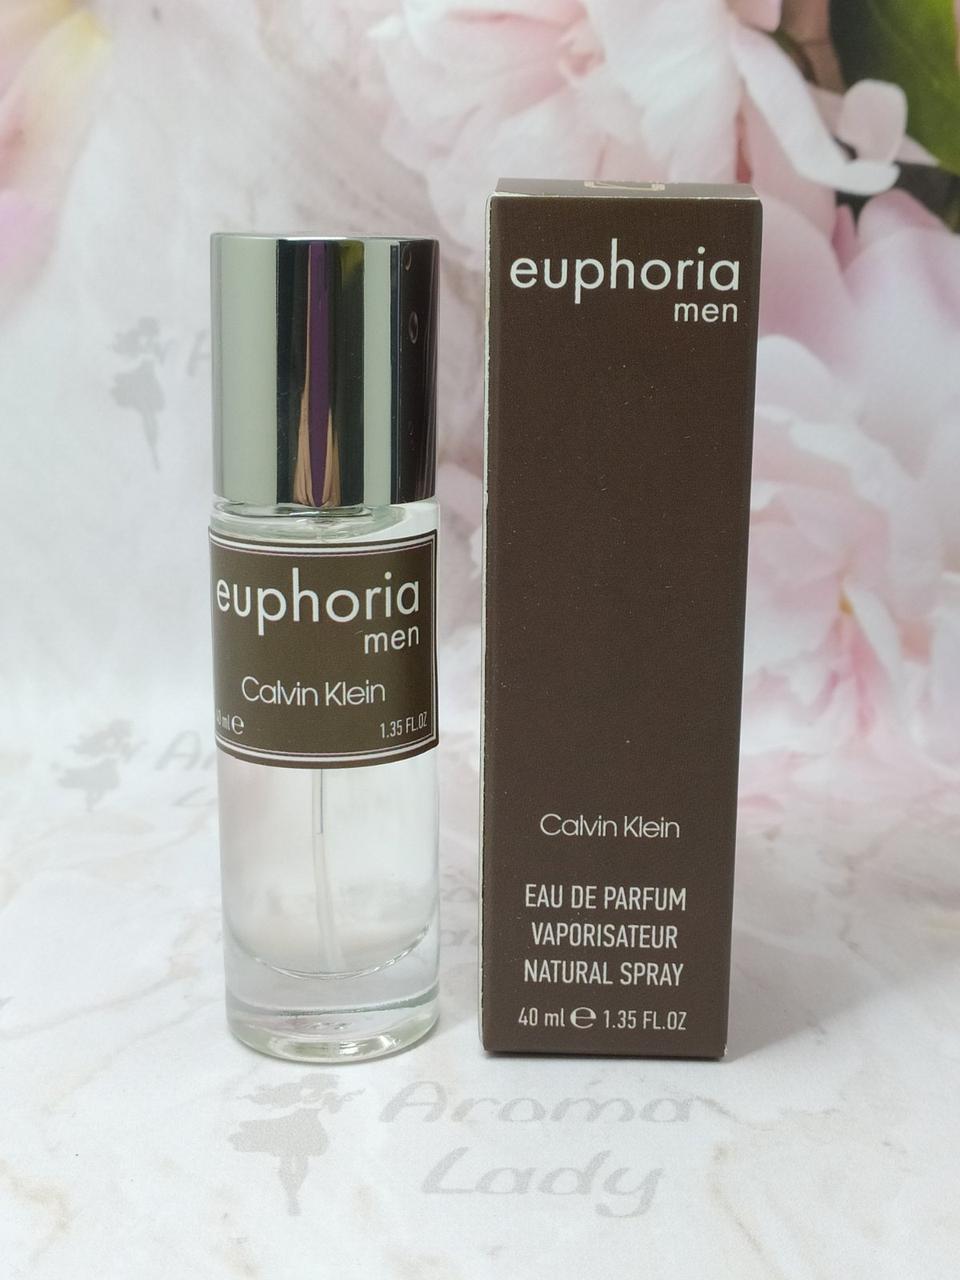 Мужской мини парфюм Calvin Klein Euphoria Men (Кэлвин Кляйн Эйфория Мен) 40мл